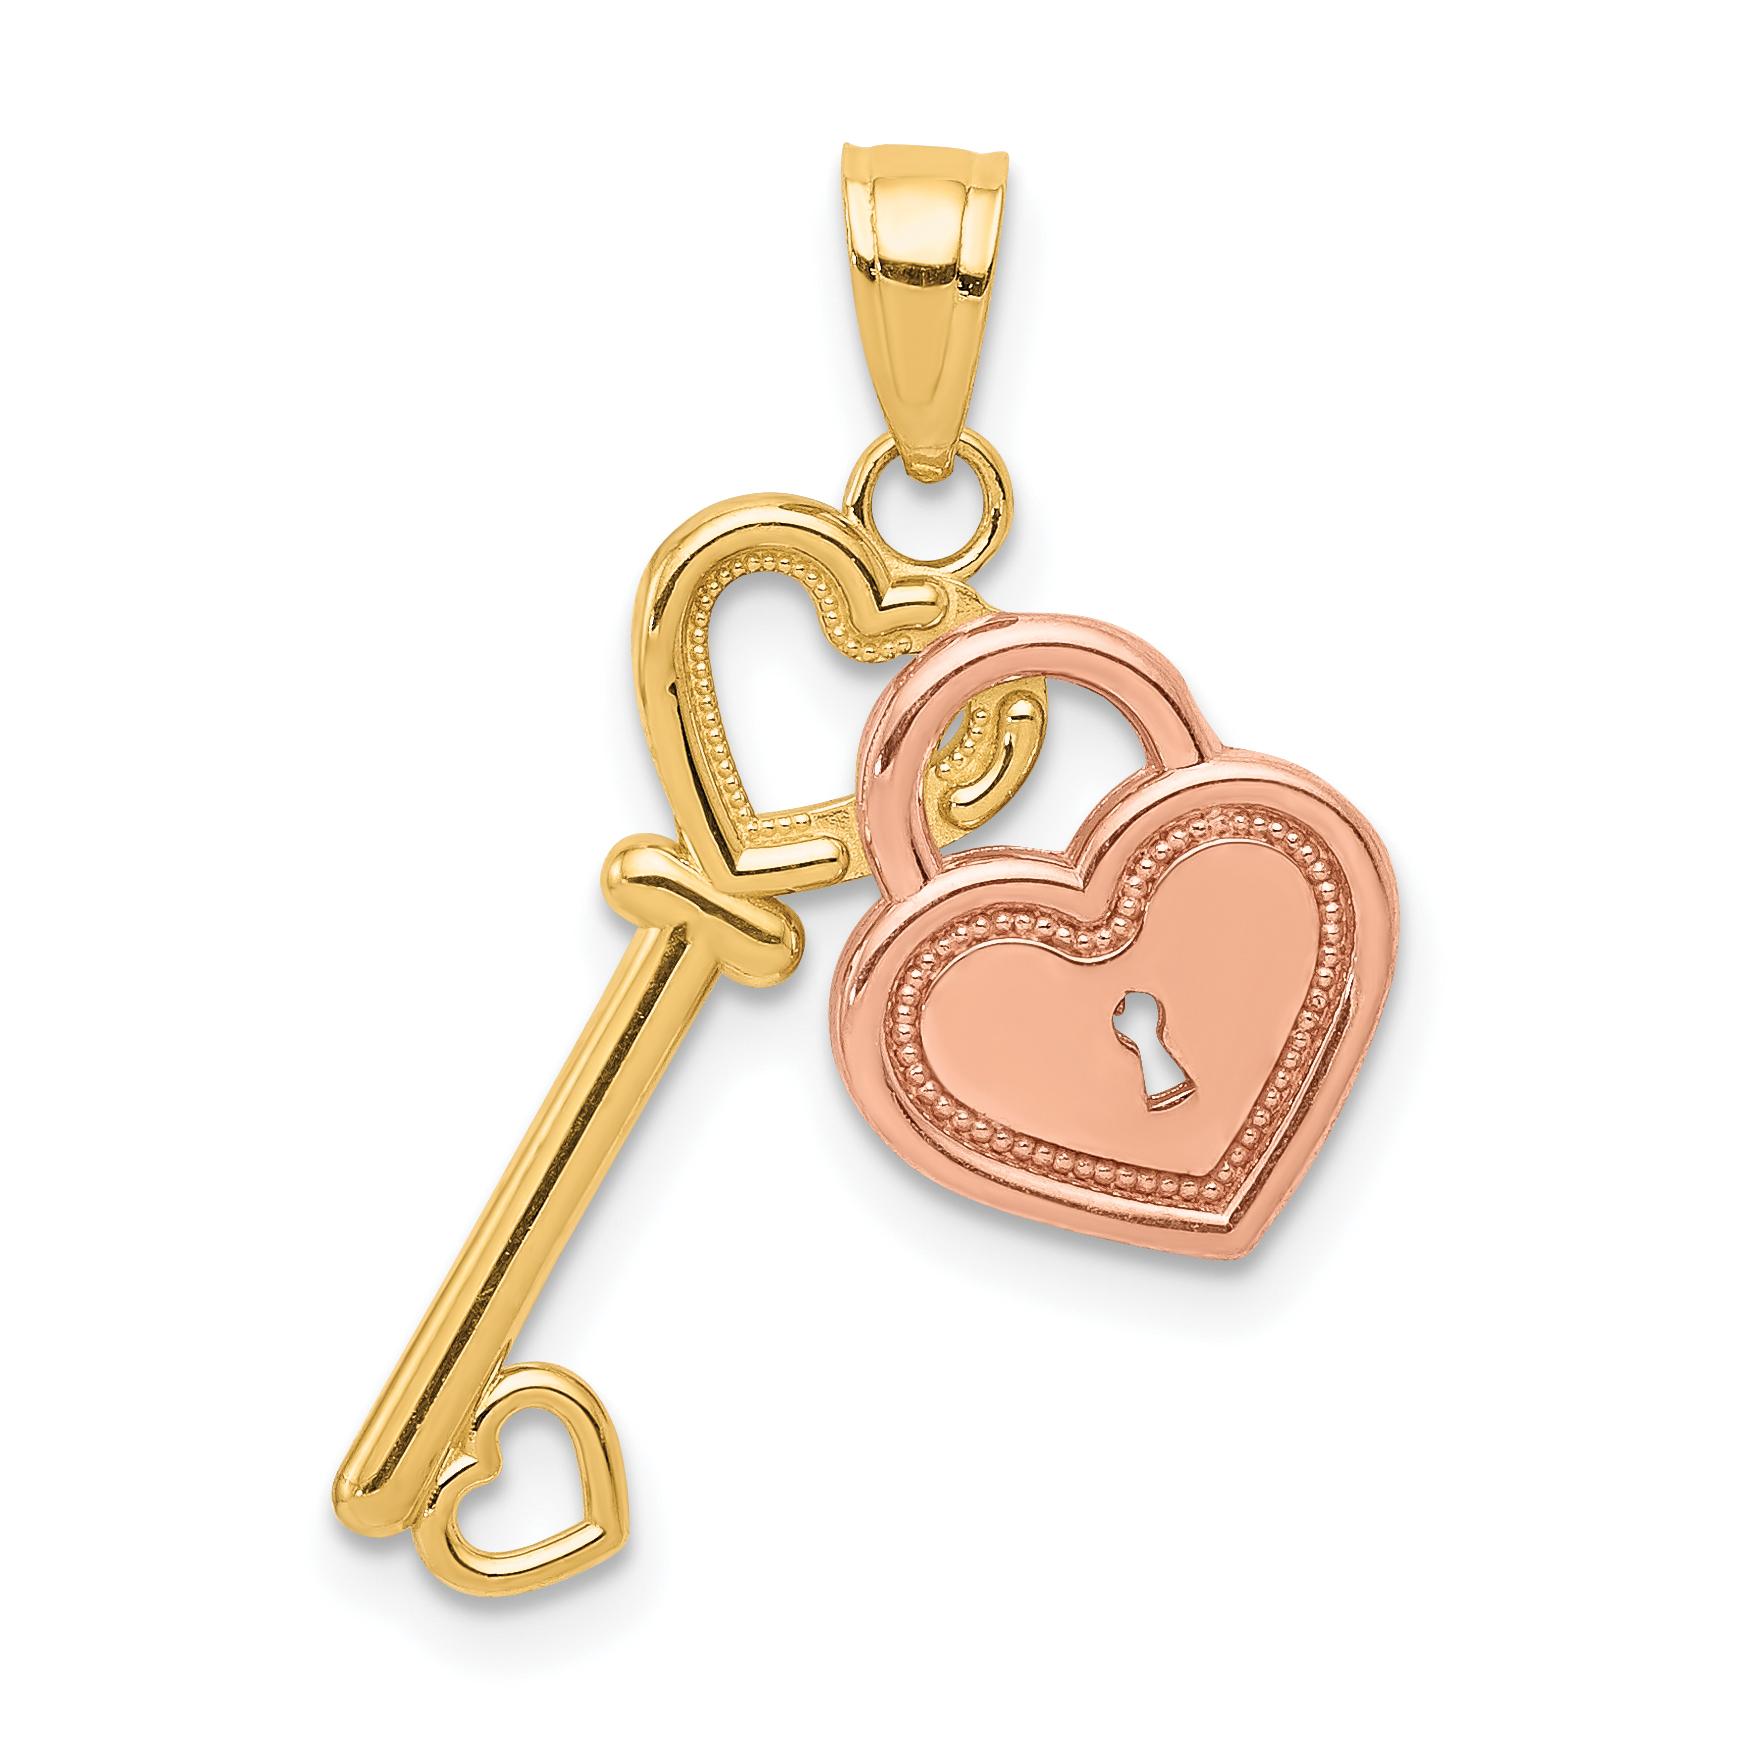 10K Two-Tone Gold Charm Pendant Themed 23 mm 18 Heart /& Key